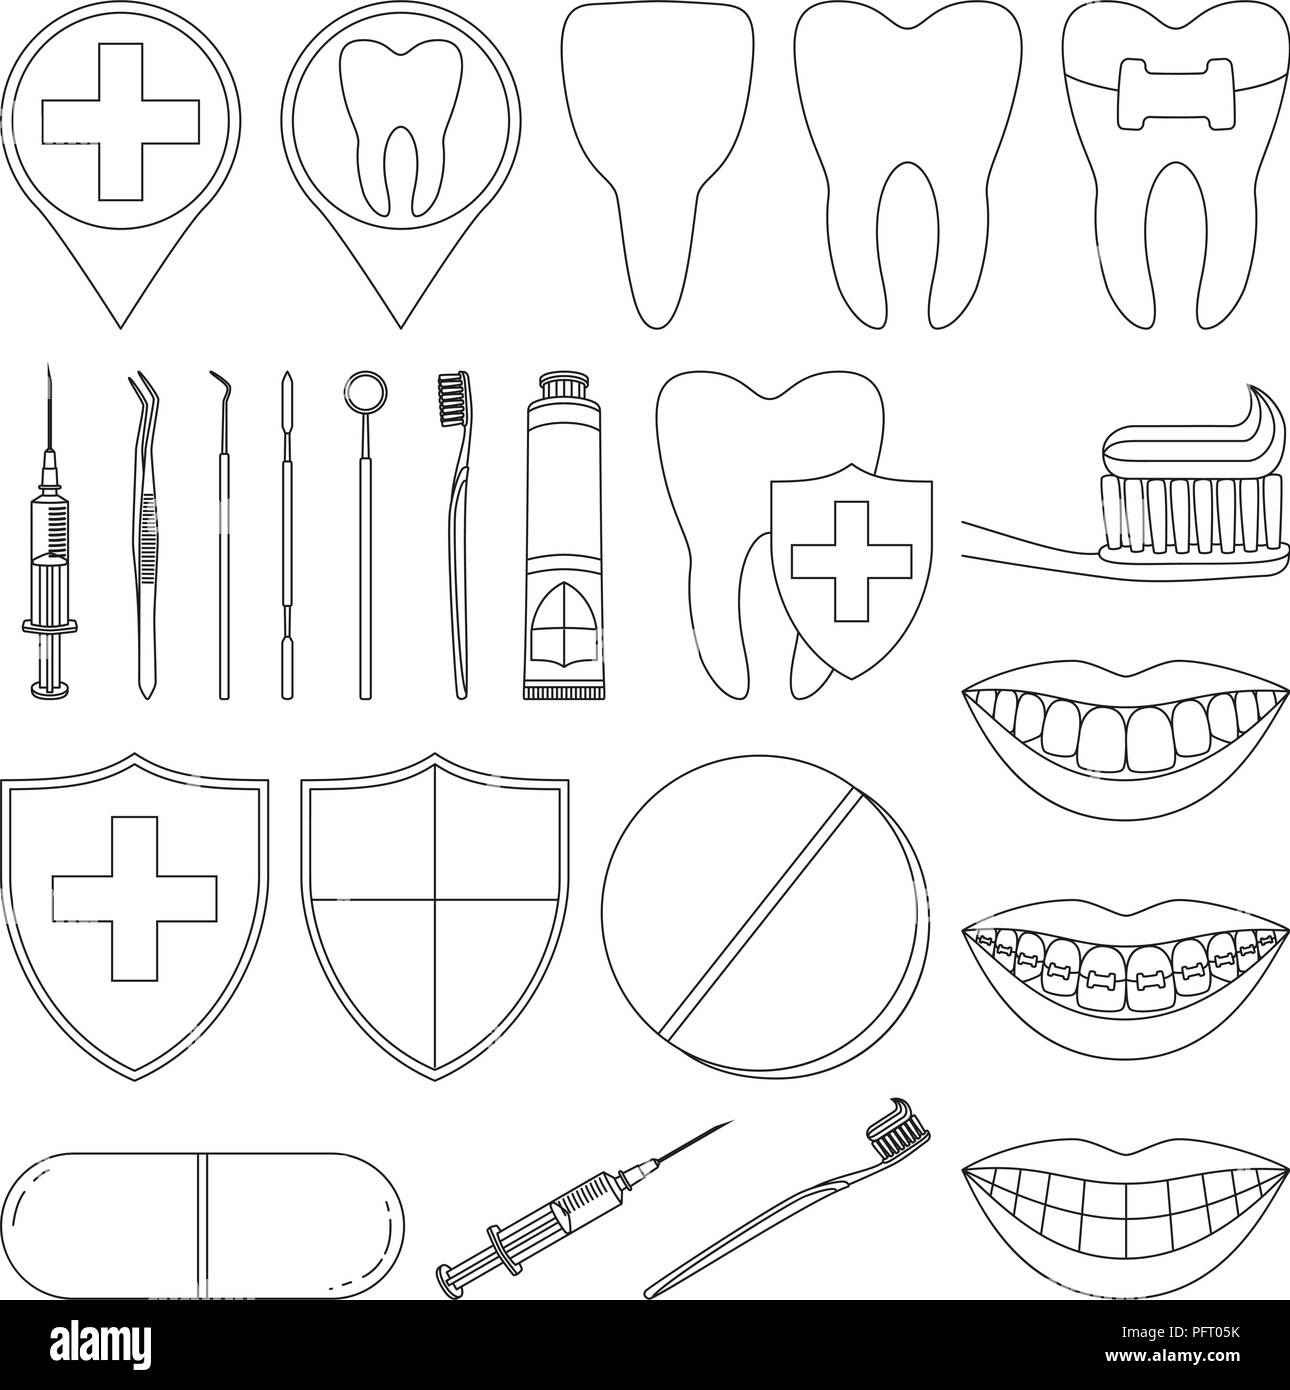 Line art black and white dental 23 elements set - Stock Vector